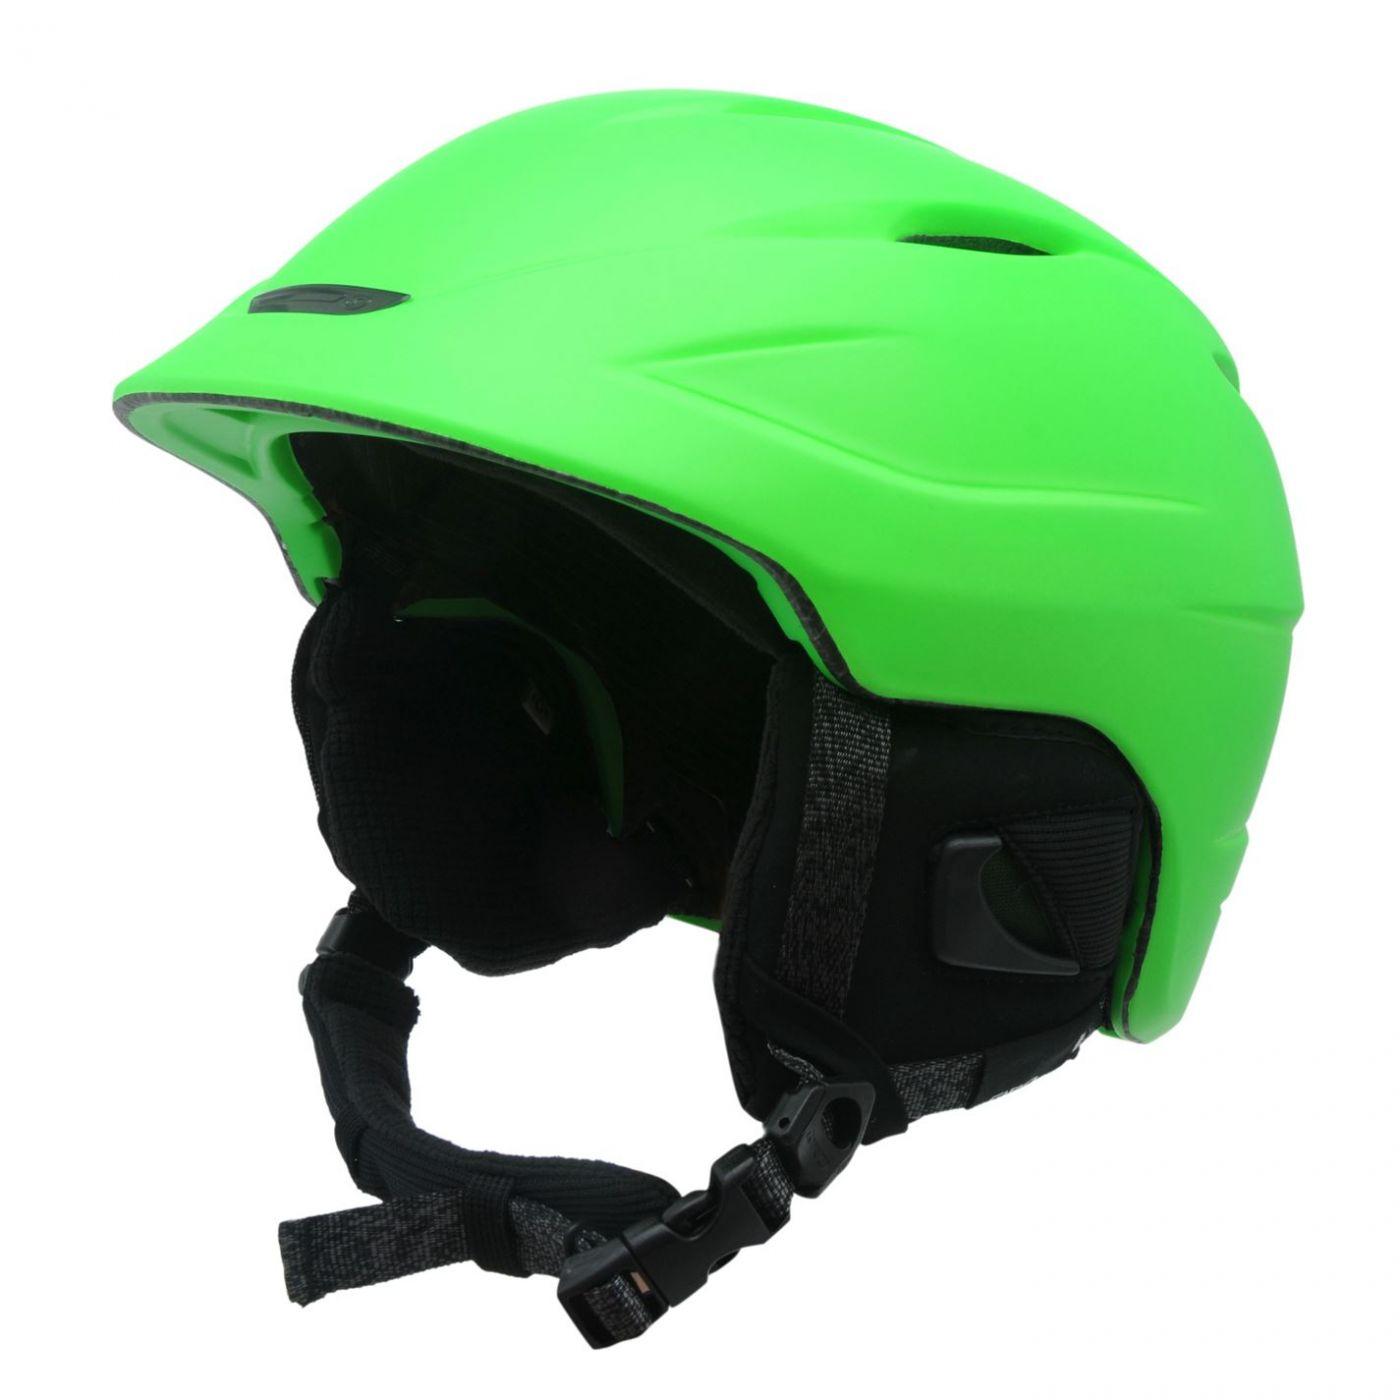 Giro Seam Mens Ski Helmet